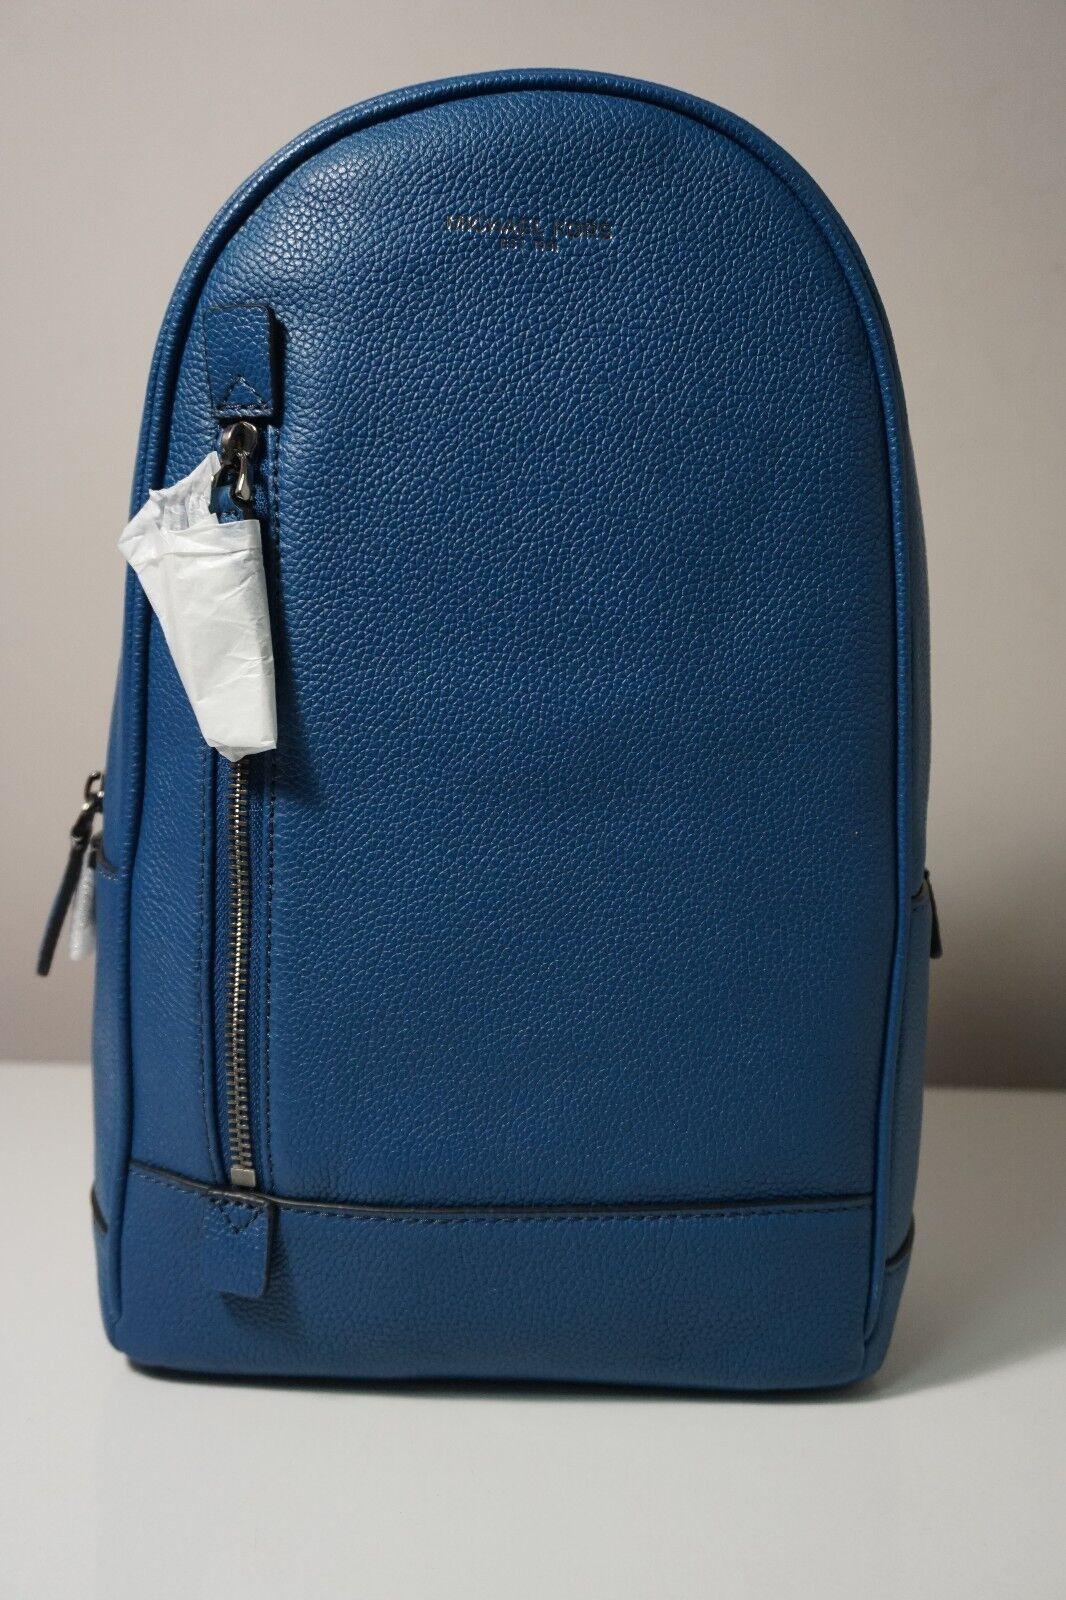 6e3ad8650730d0 Michael Kors Russel Sling Pack Bag Leather 37t7lruc8l for sale ...